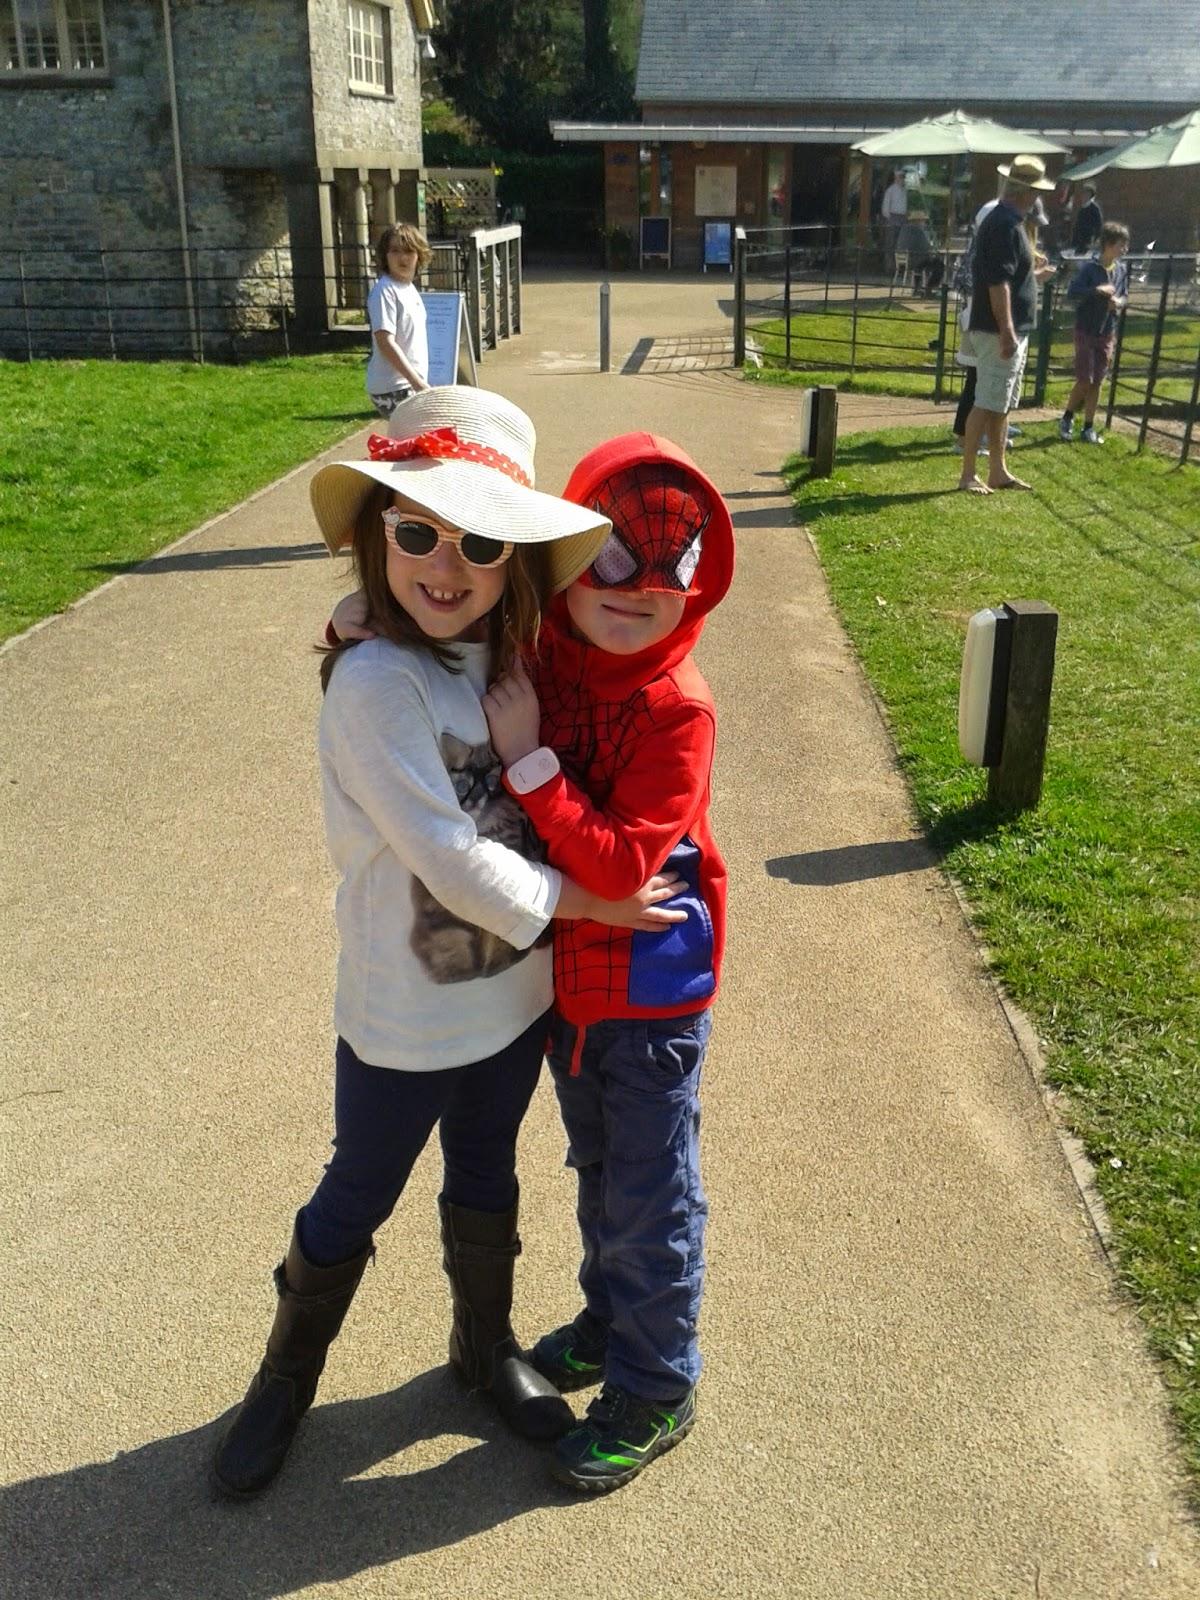 Caitlin & Ieuan at Dyffrn Gardens